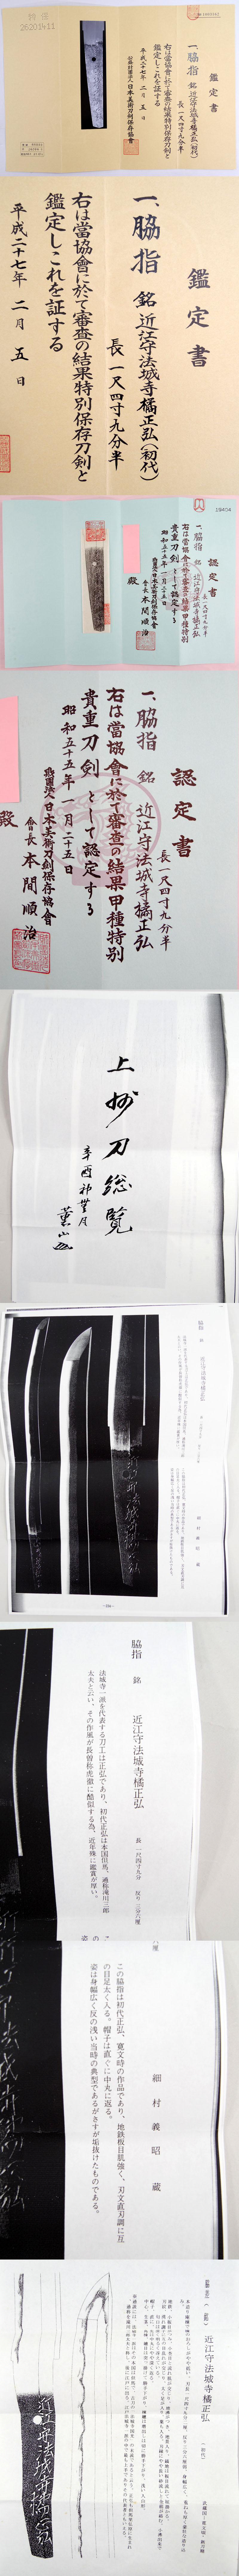 近江守法城寺橘正弘 Picture of Certificate